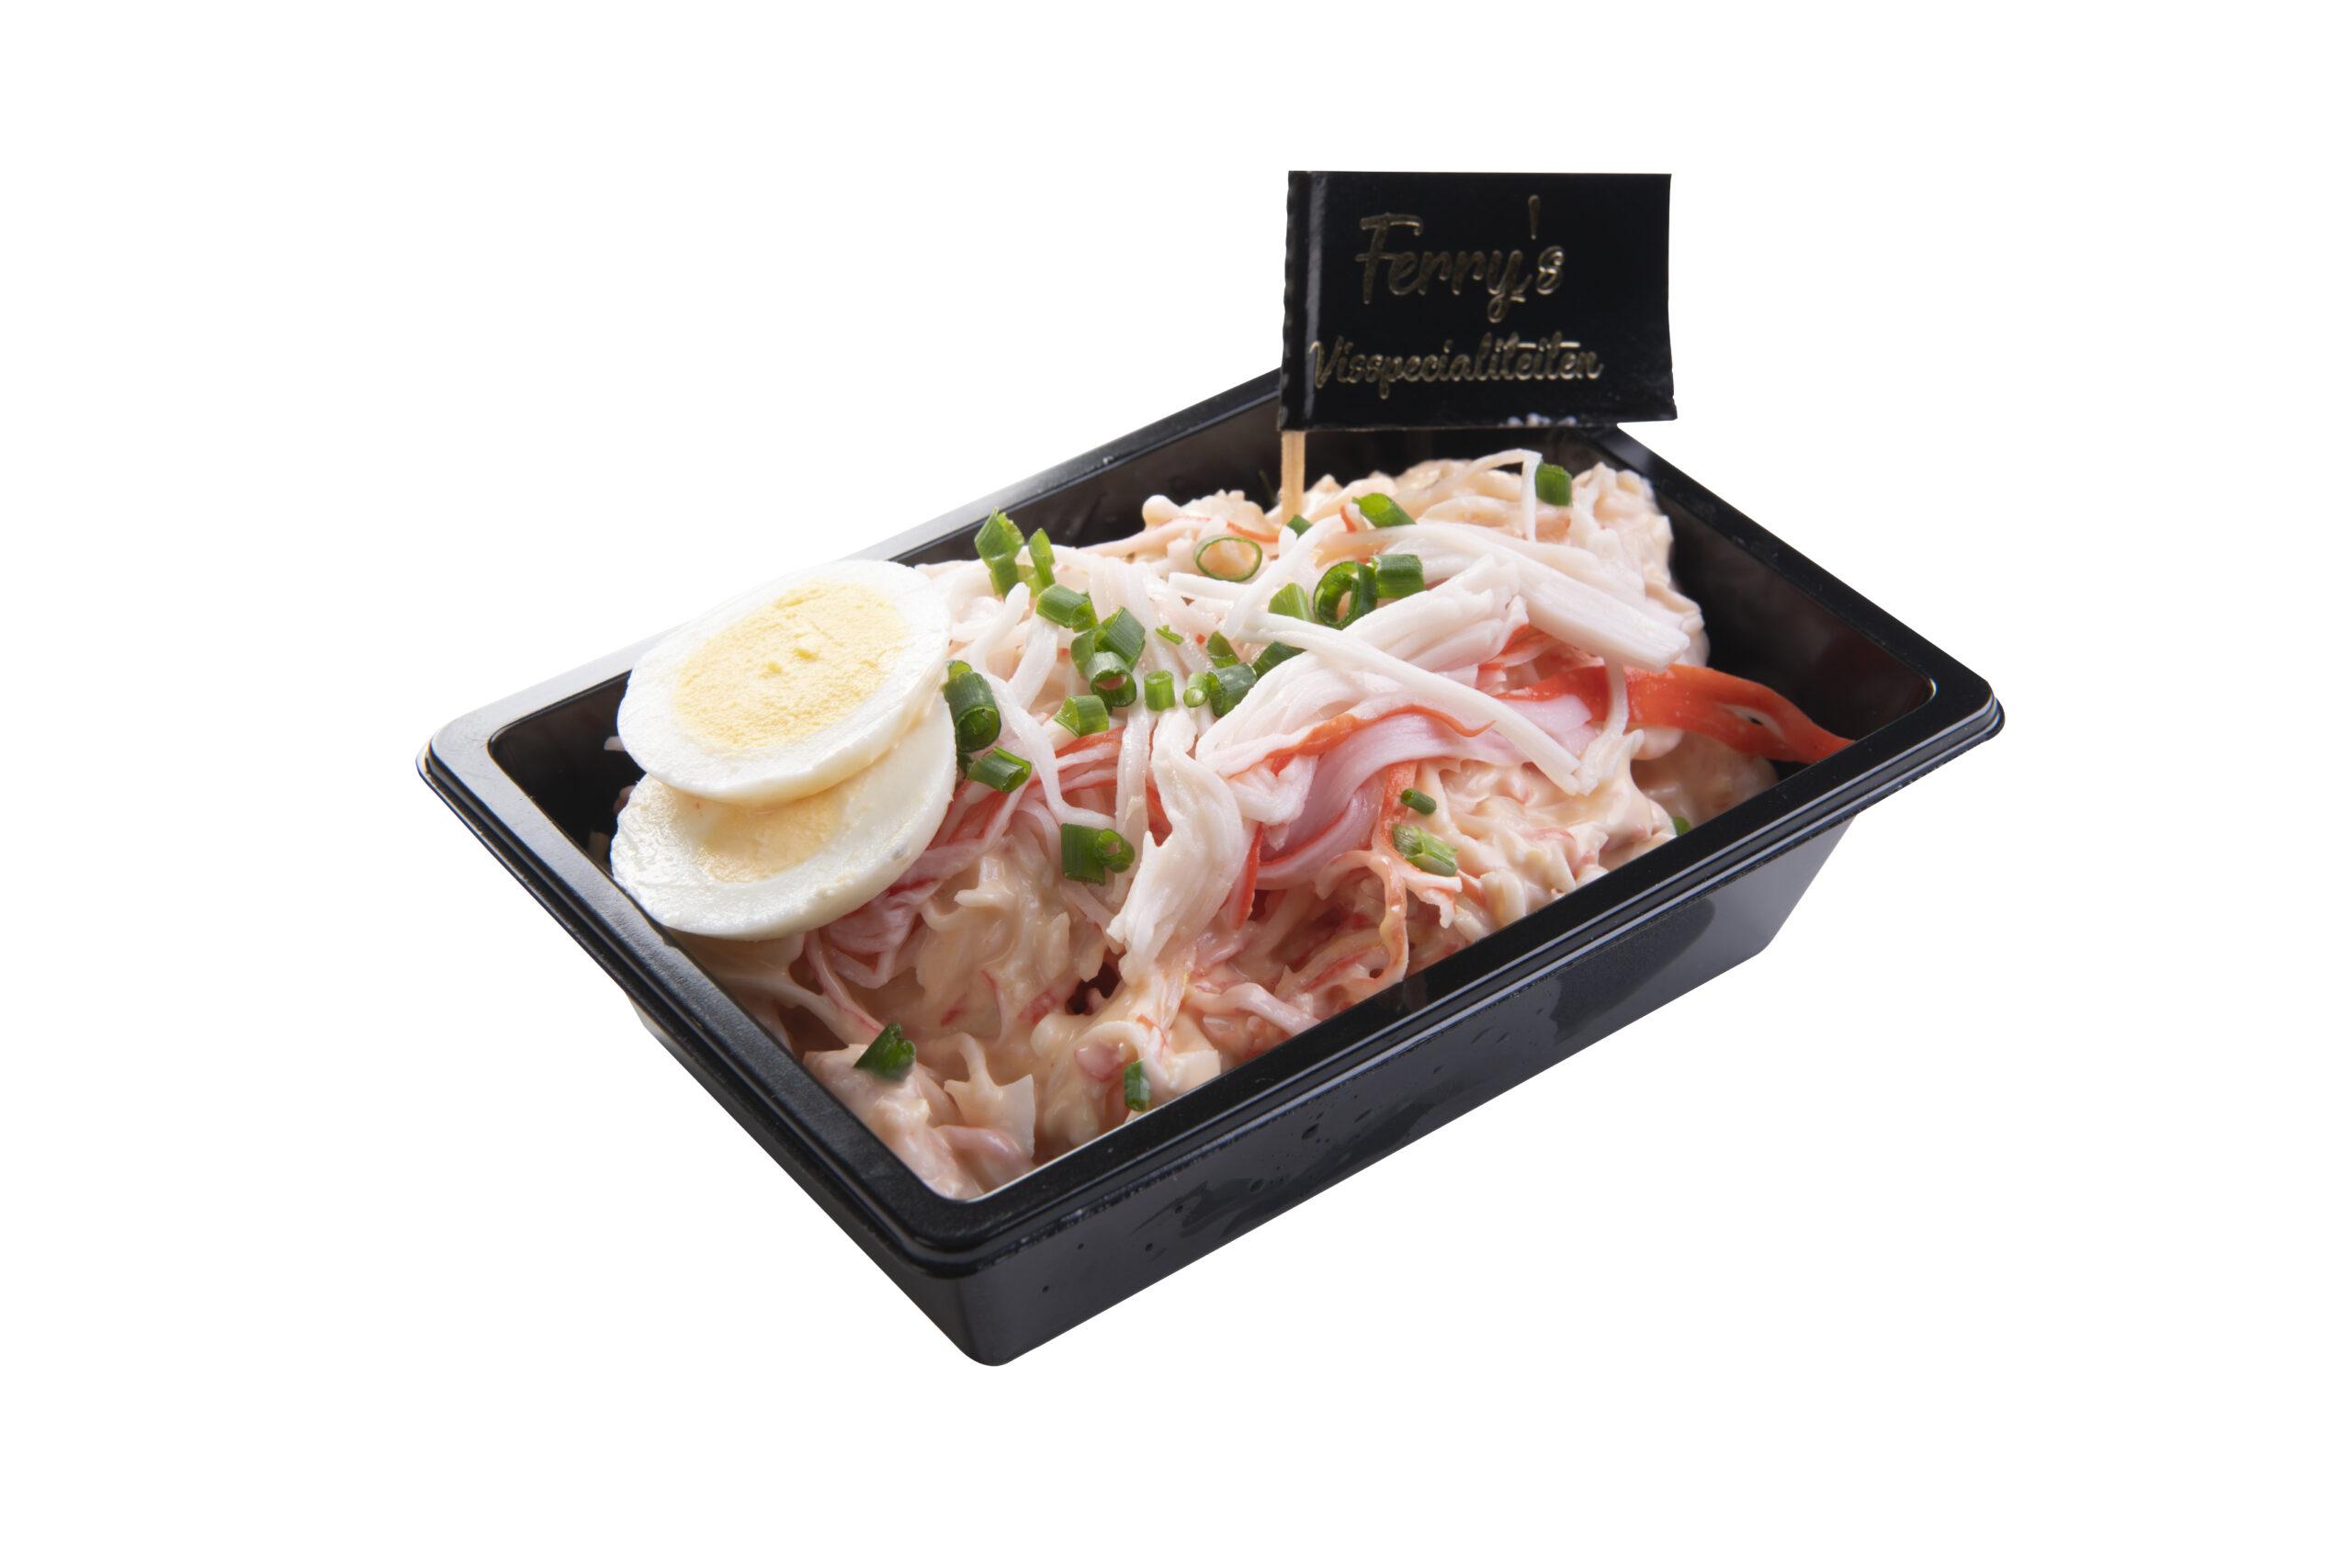 Krab Garnalen Salade Per 100 Gram